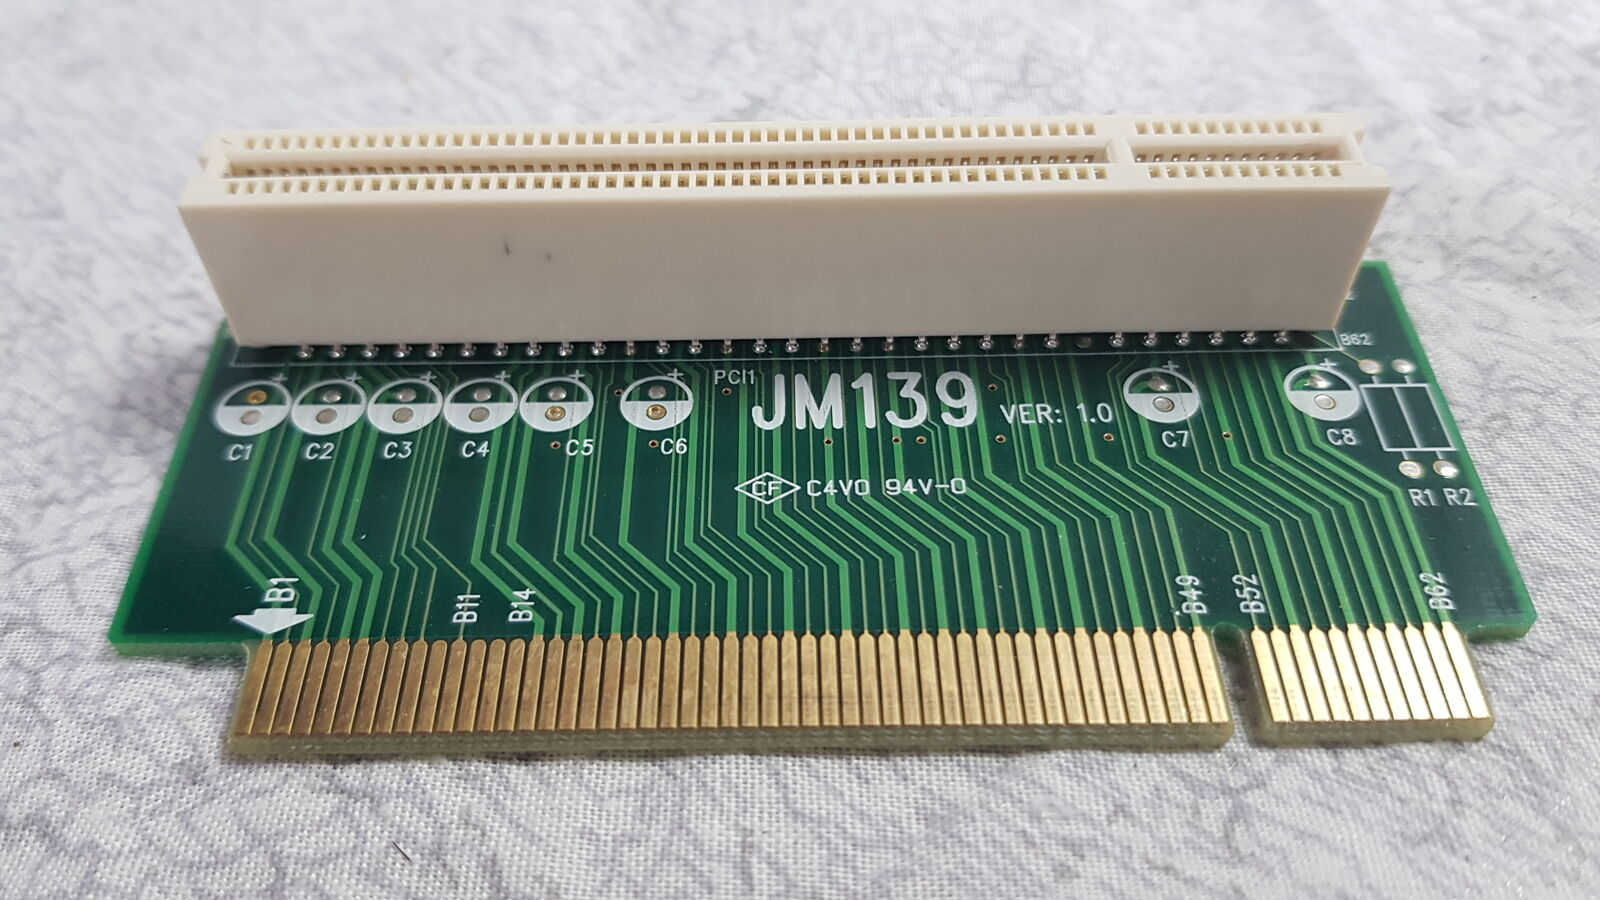 Morex JM139 Ver. 1.0, 90 Degree PCI Riser Card ONLY Grade A